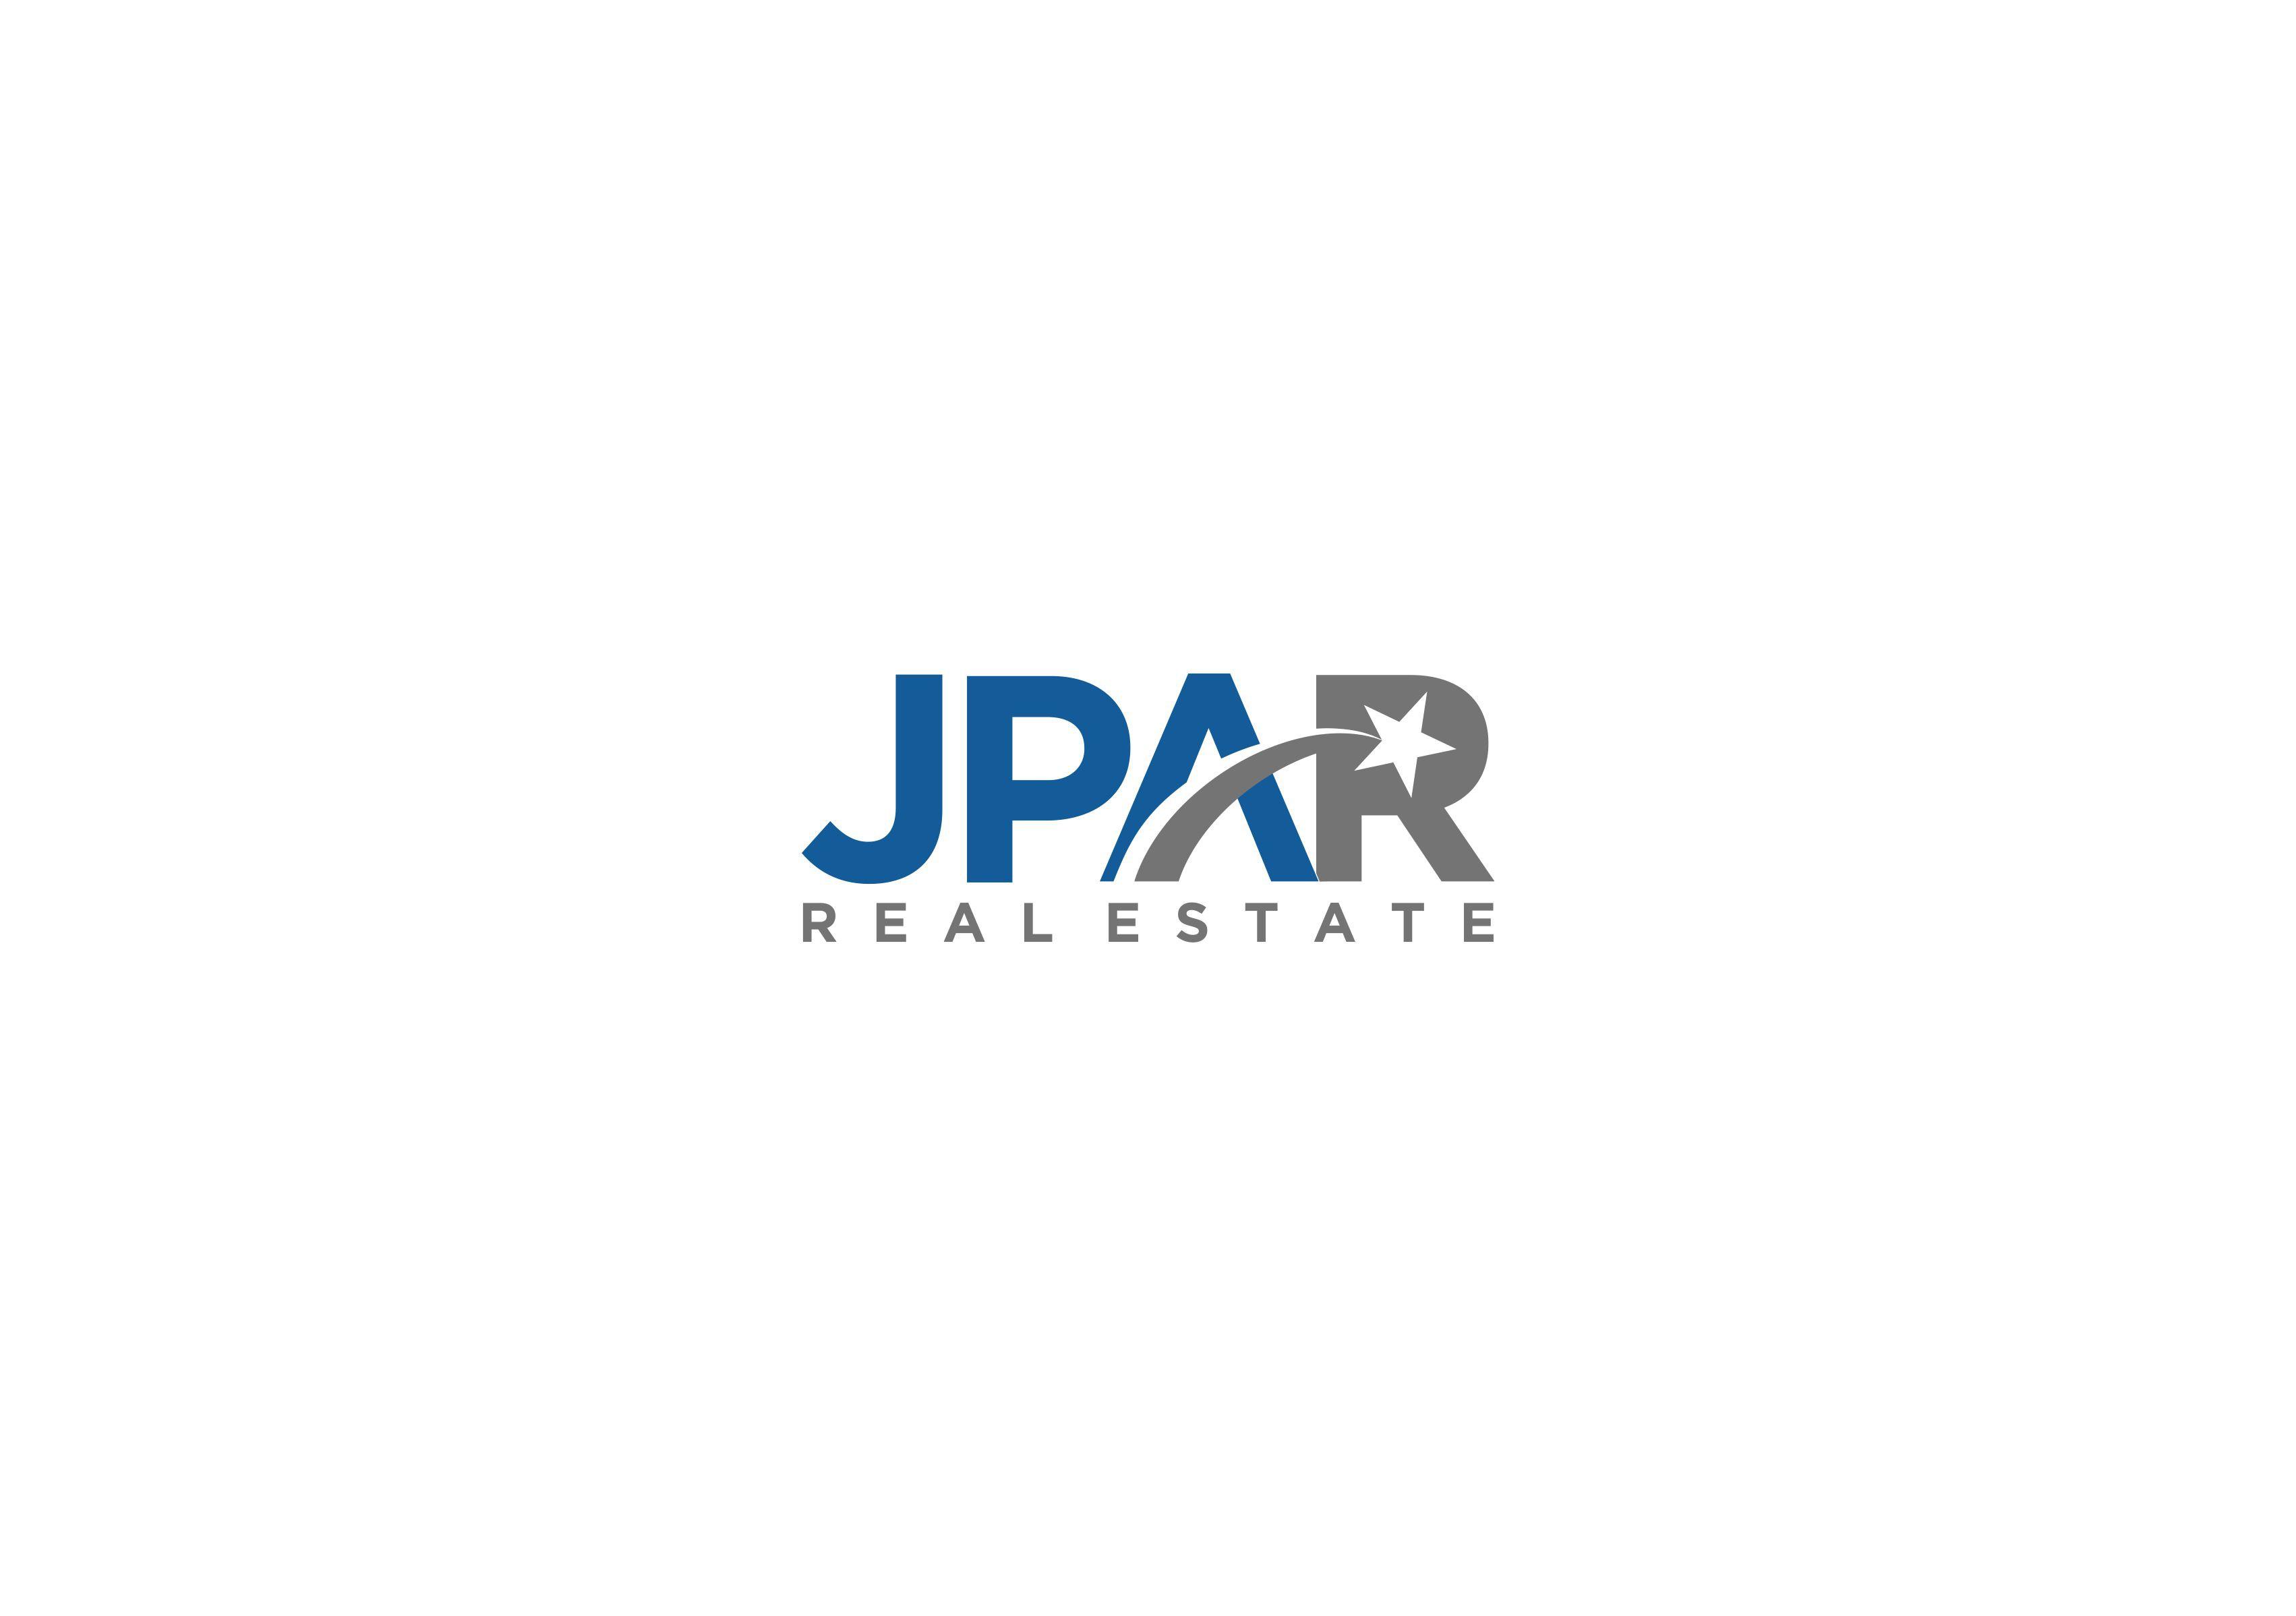 Refreshed logo for residential real estate brokerage.